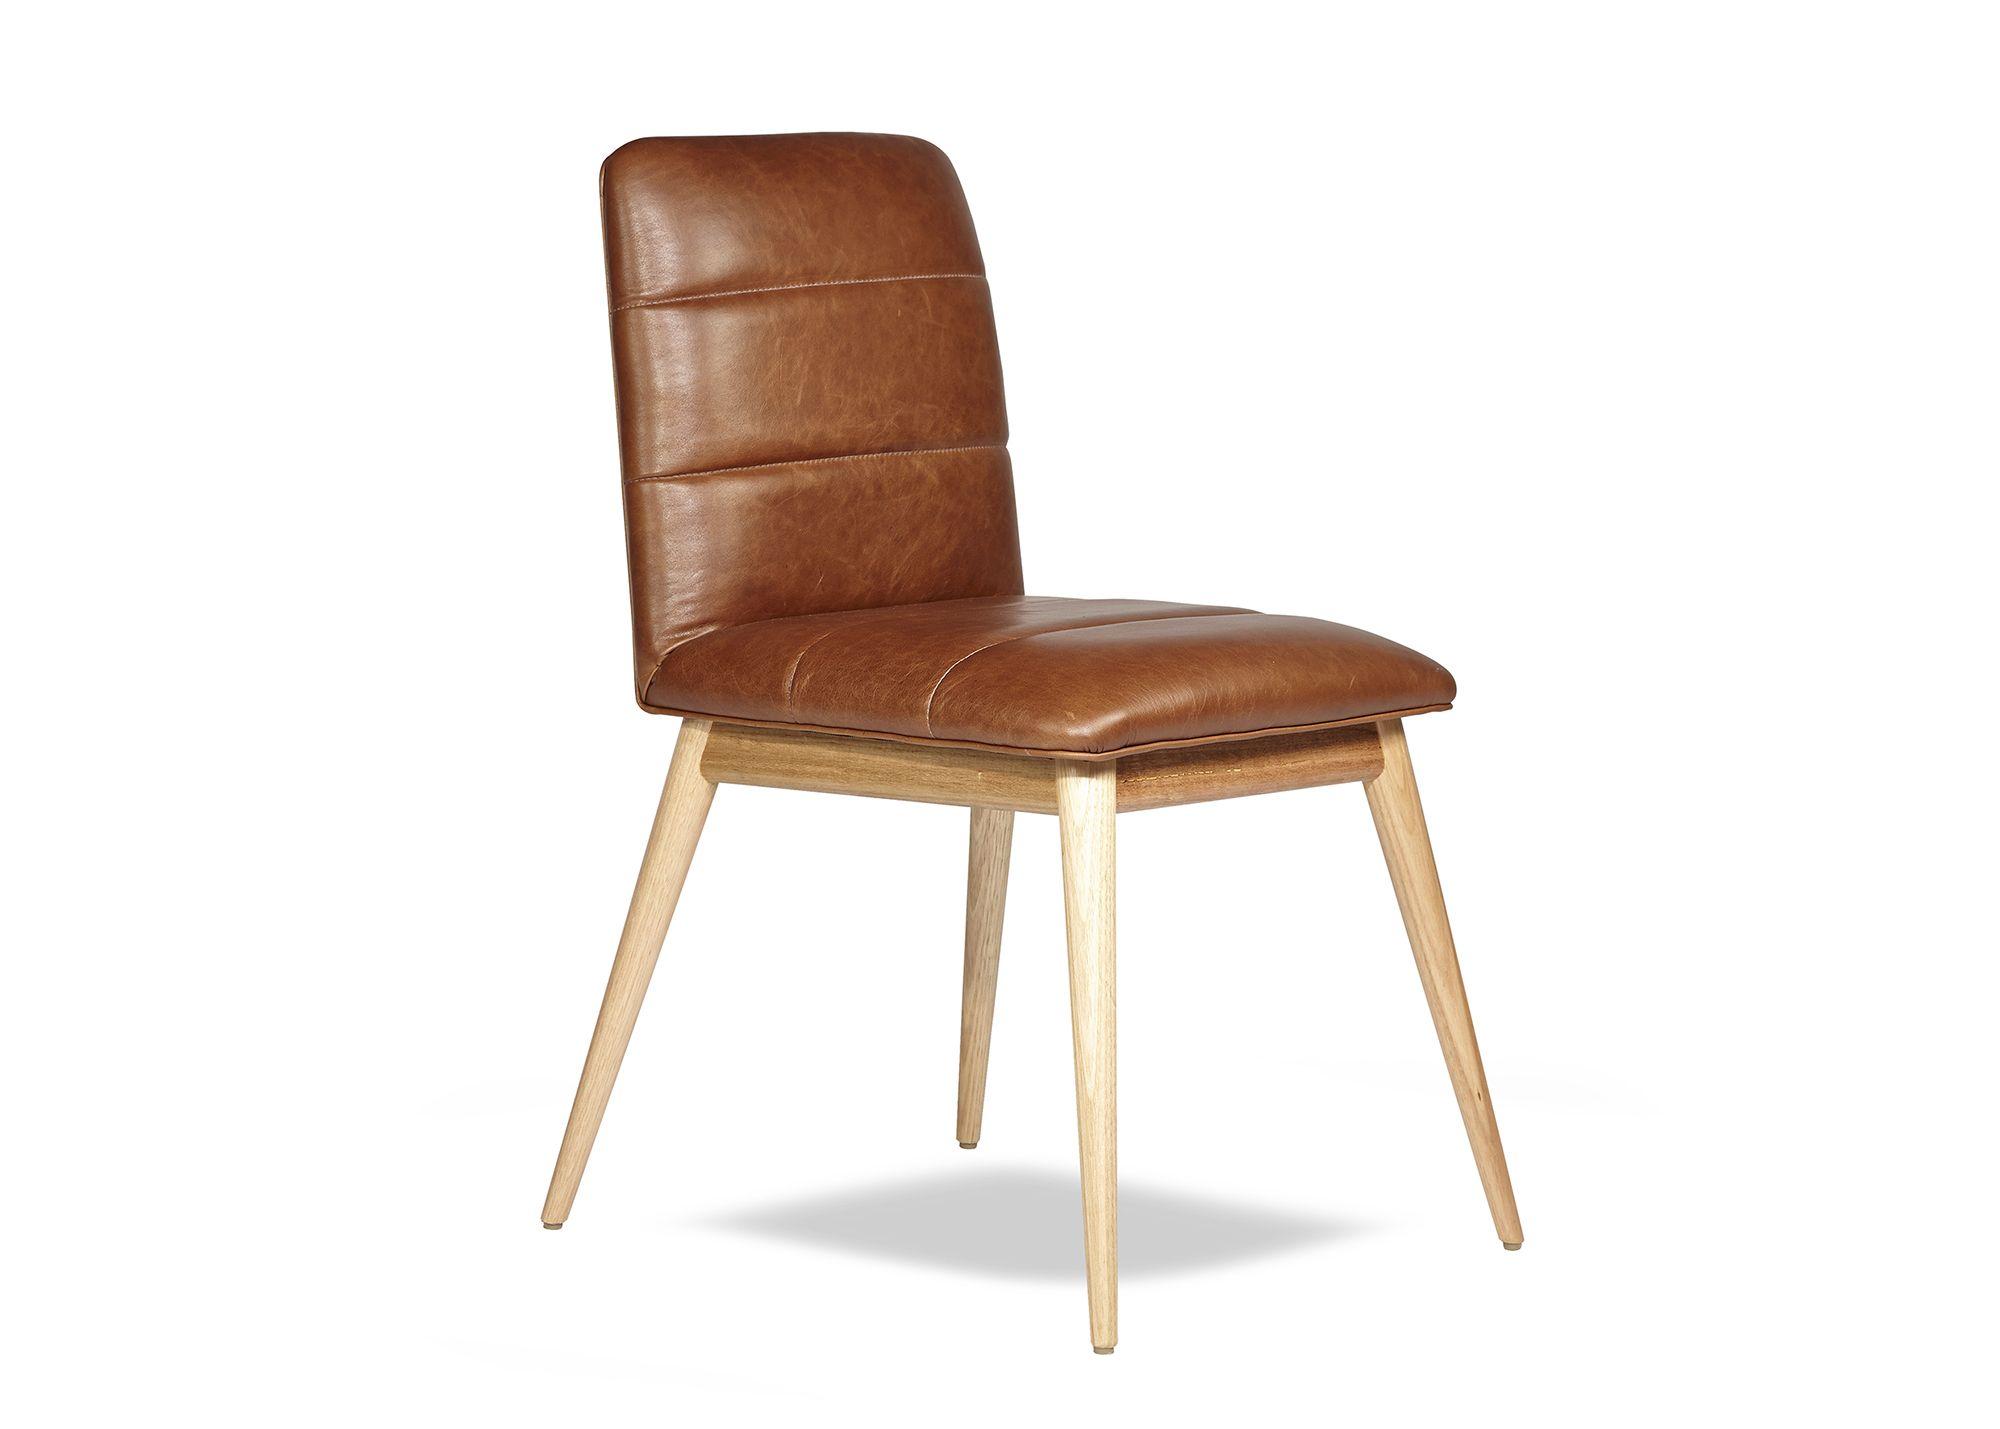 Arthur G Reuben Chair Leather Dining Chair